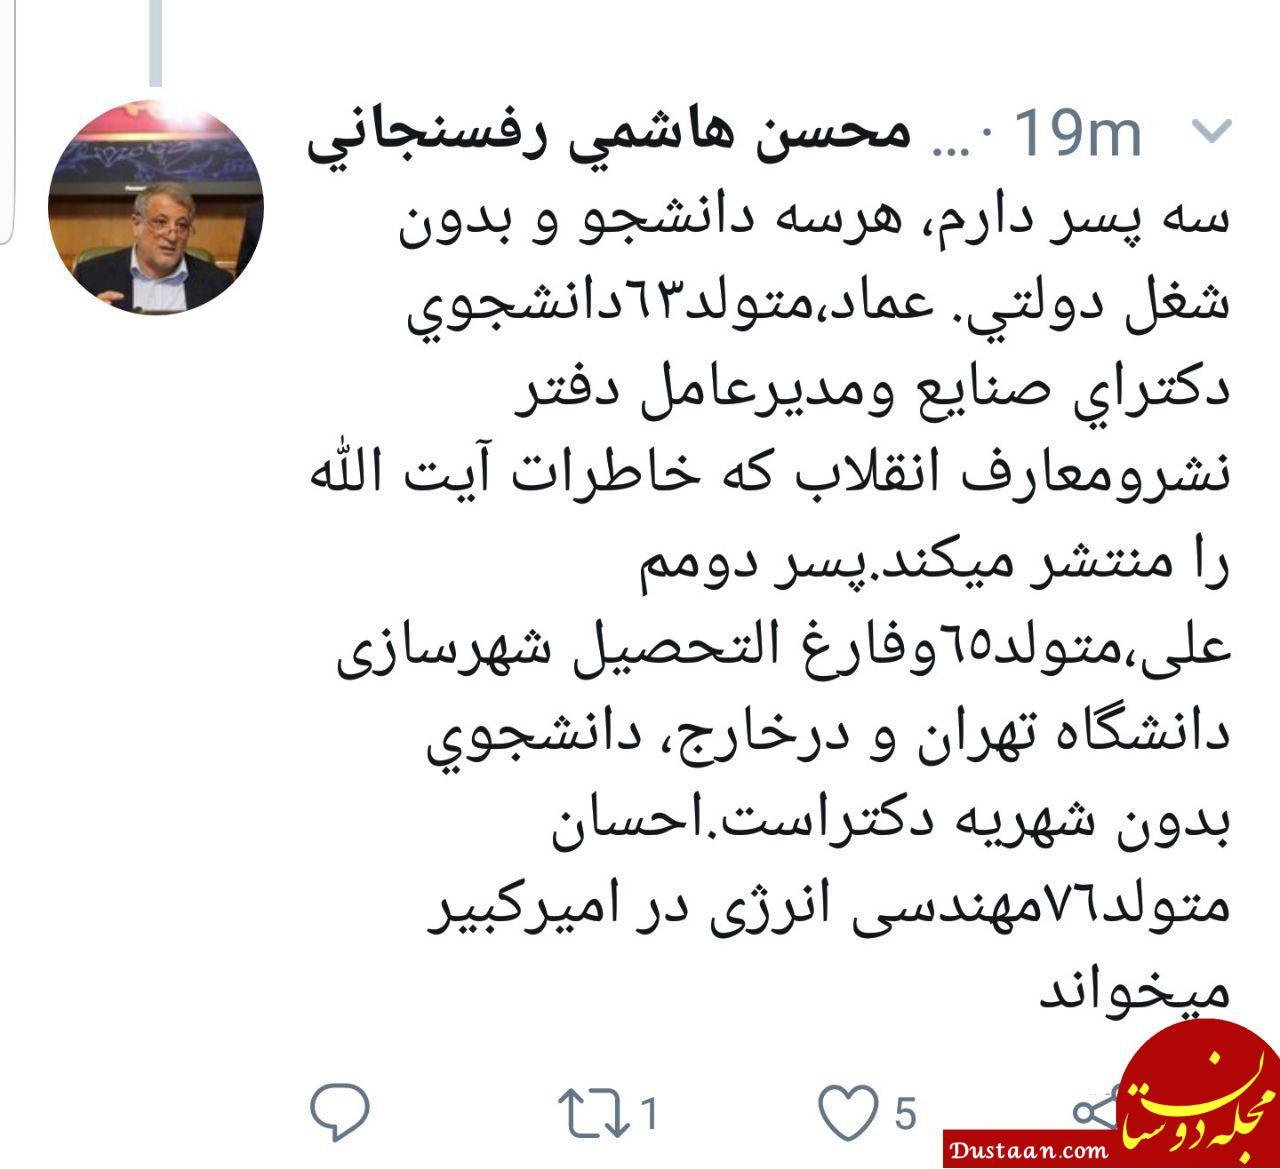 www.dustaan.com شغل فرزندان محسن هاشمی فاش شد +عکس